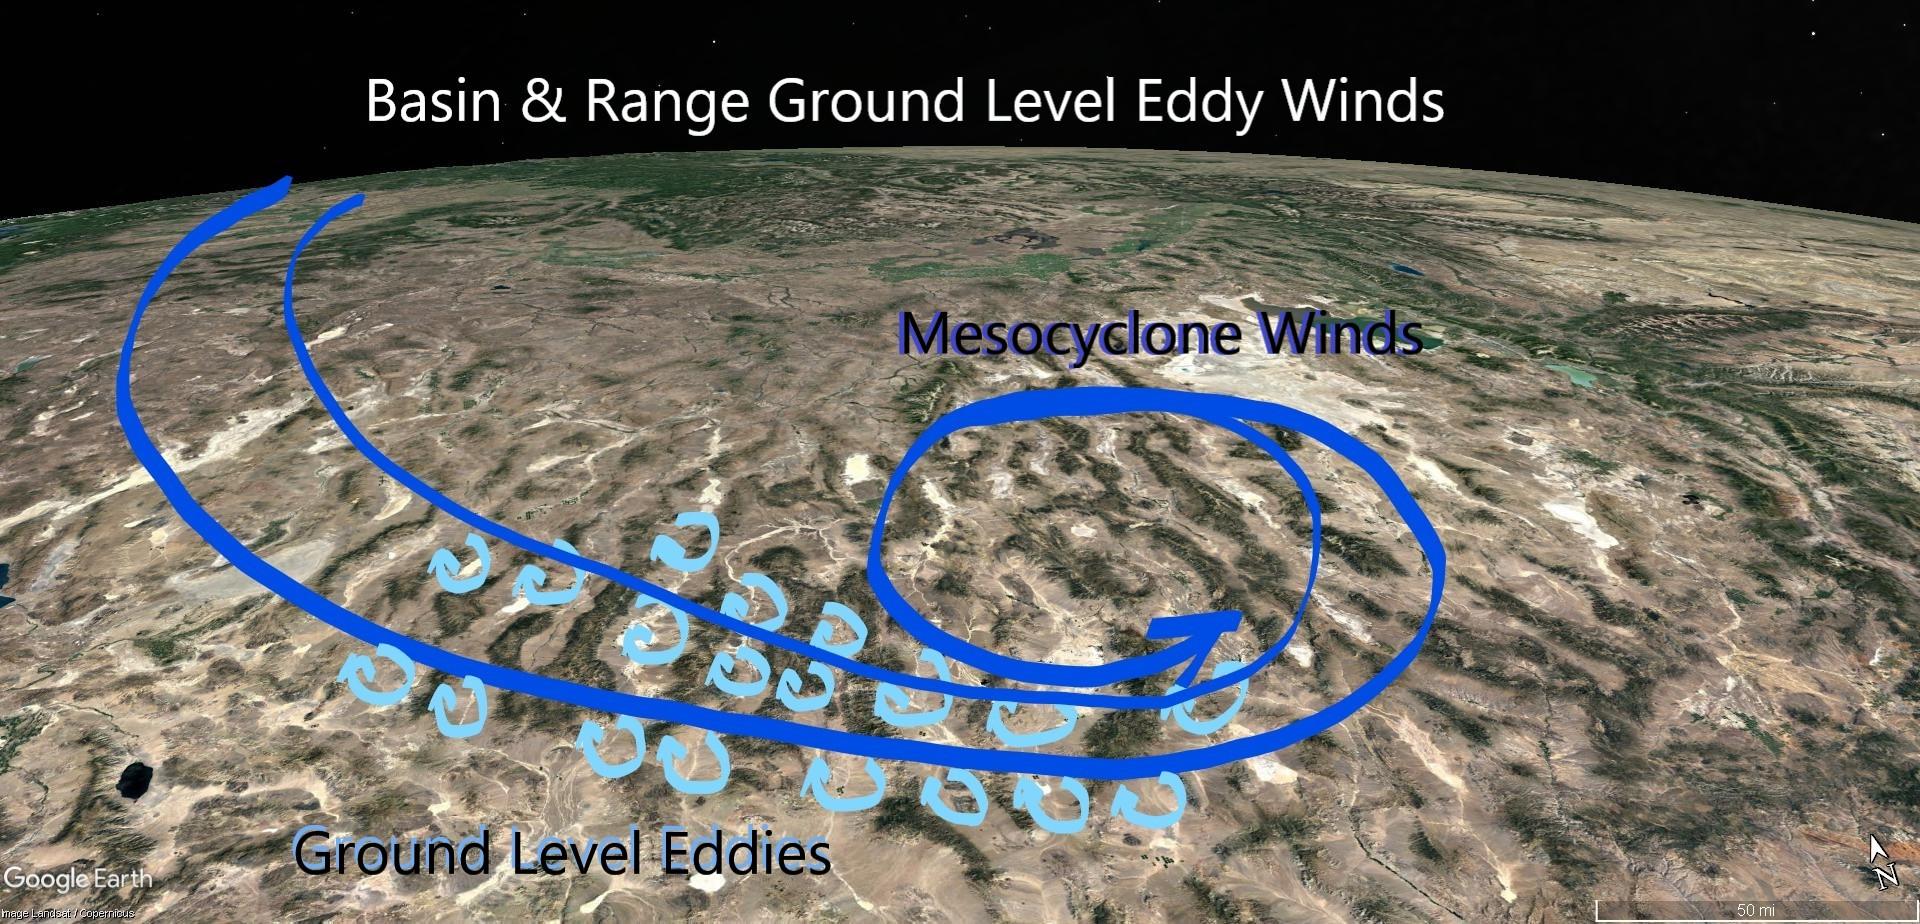 Eddy winds22